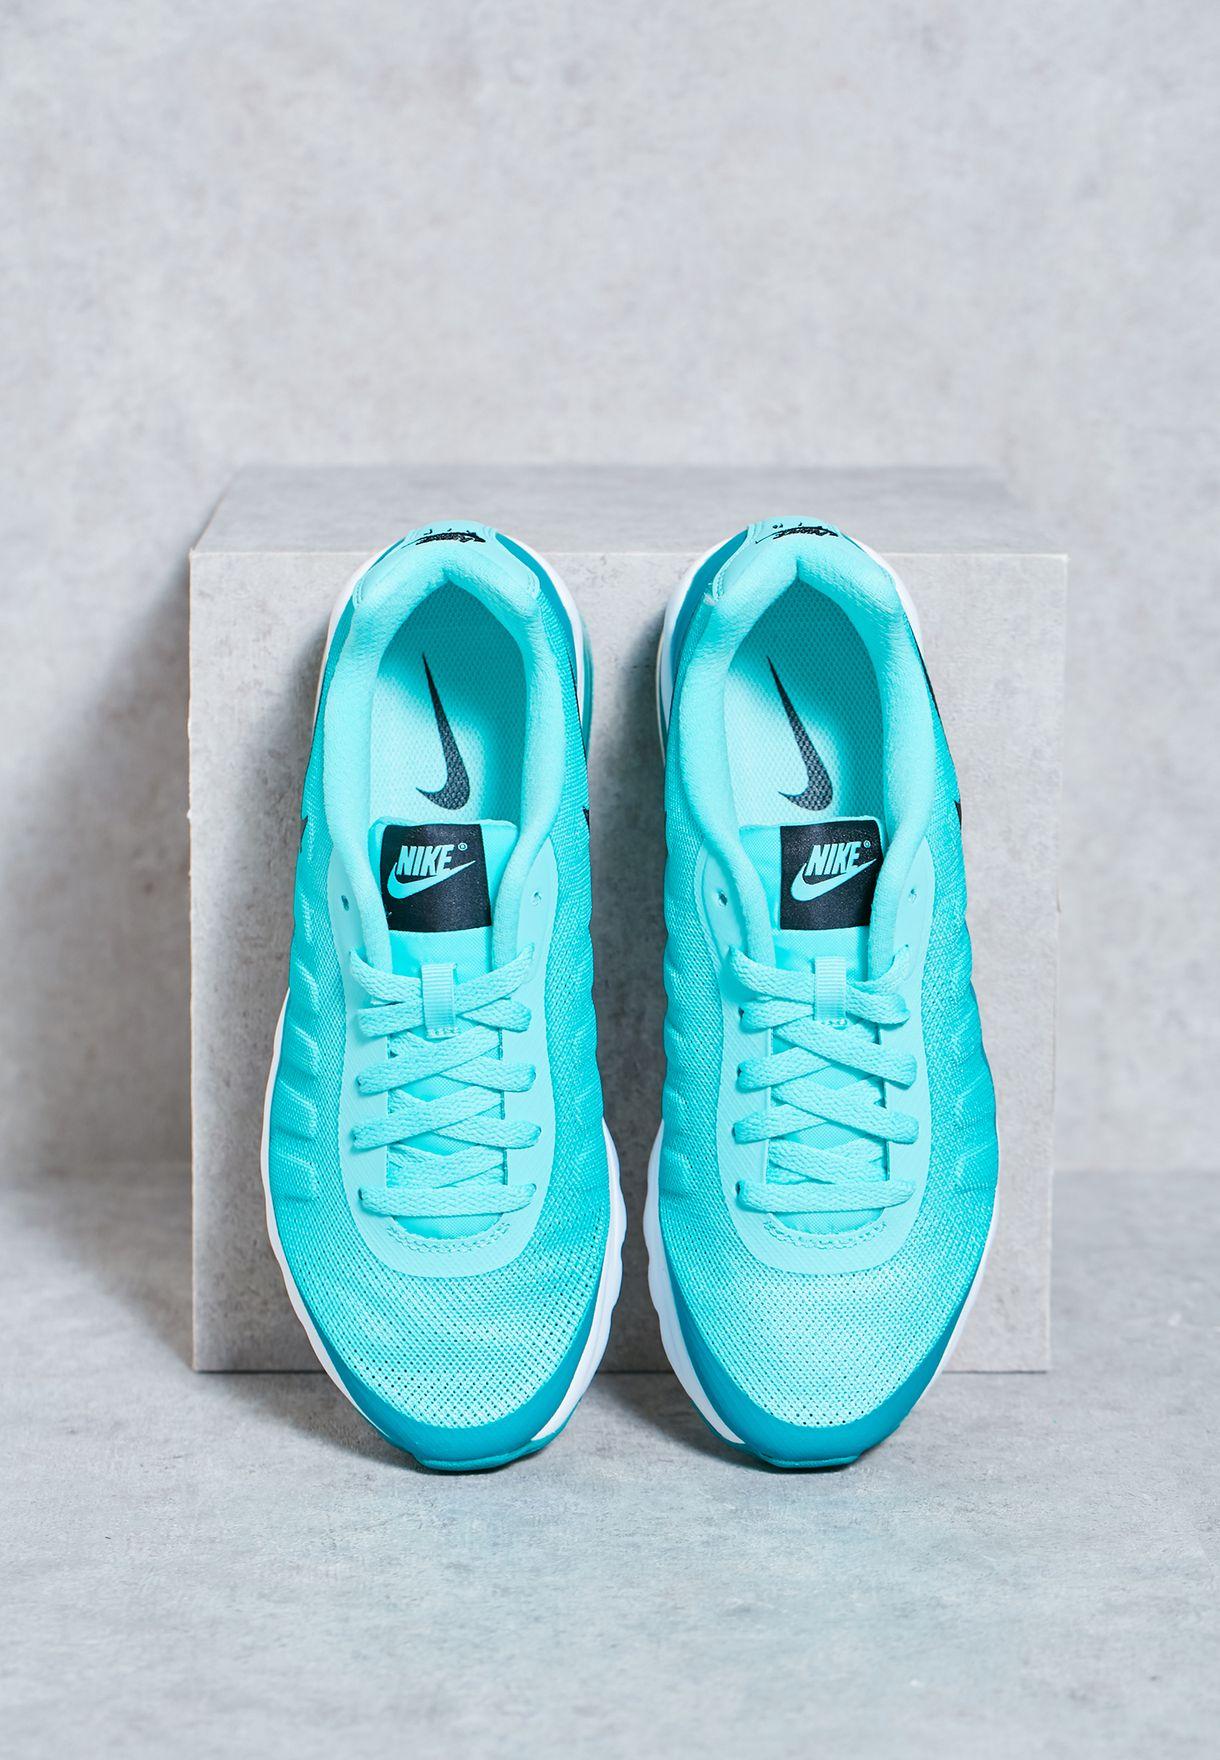 b5adcf414f9 Shop Nike green Air Max Invigor Print 749862-300 for Women in UAE ...